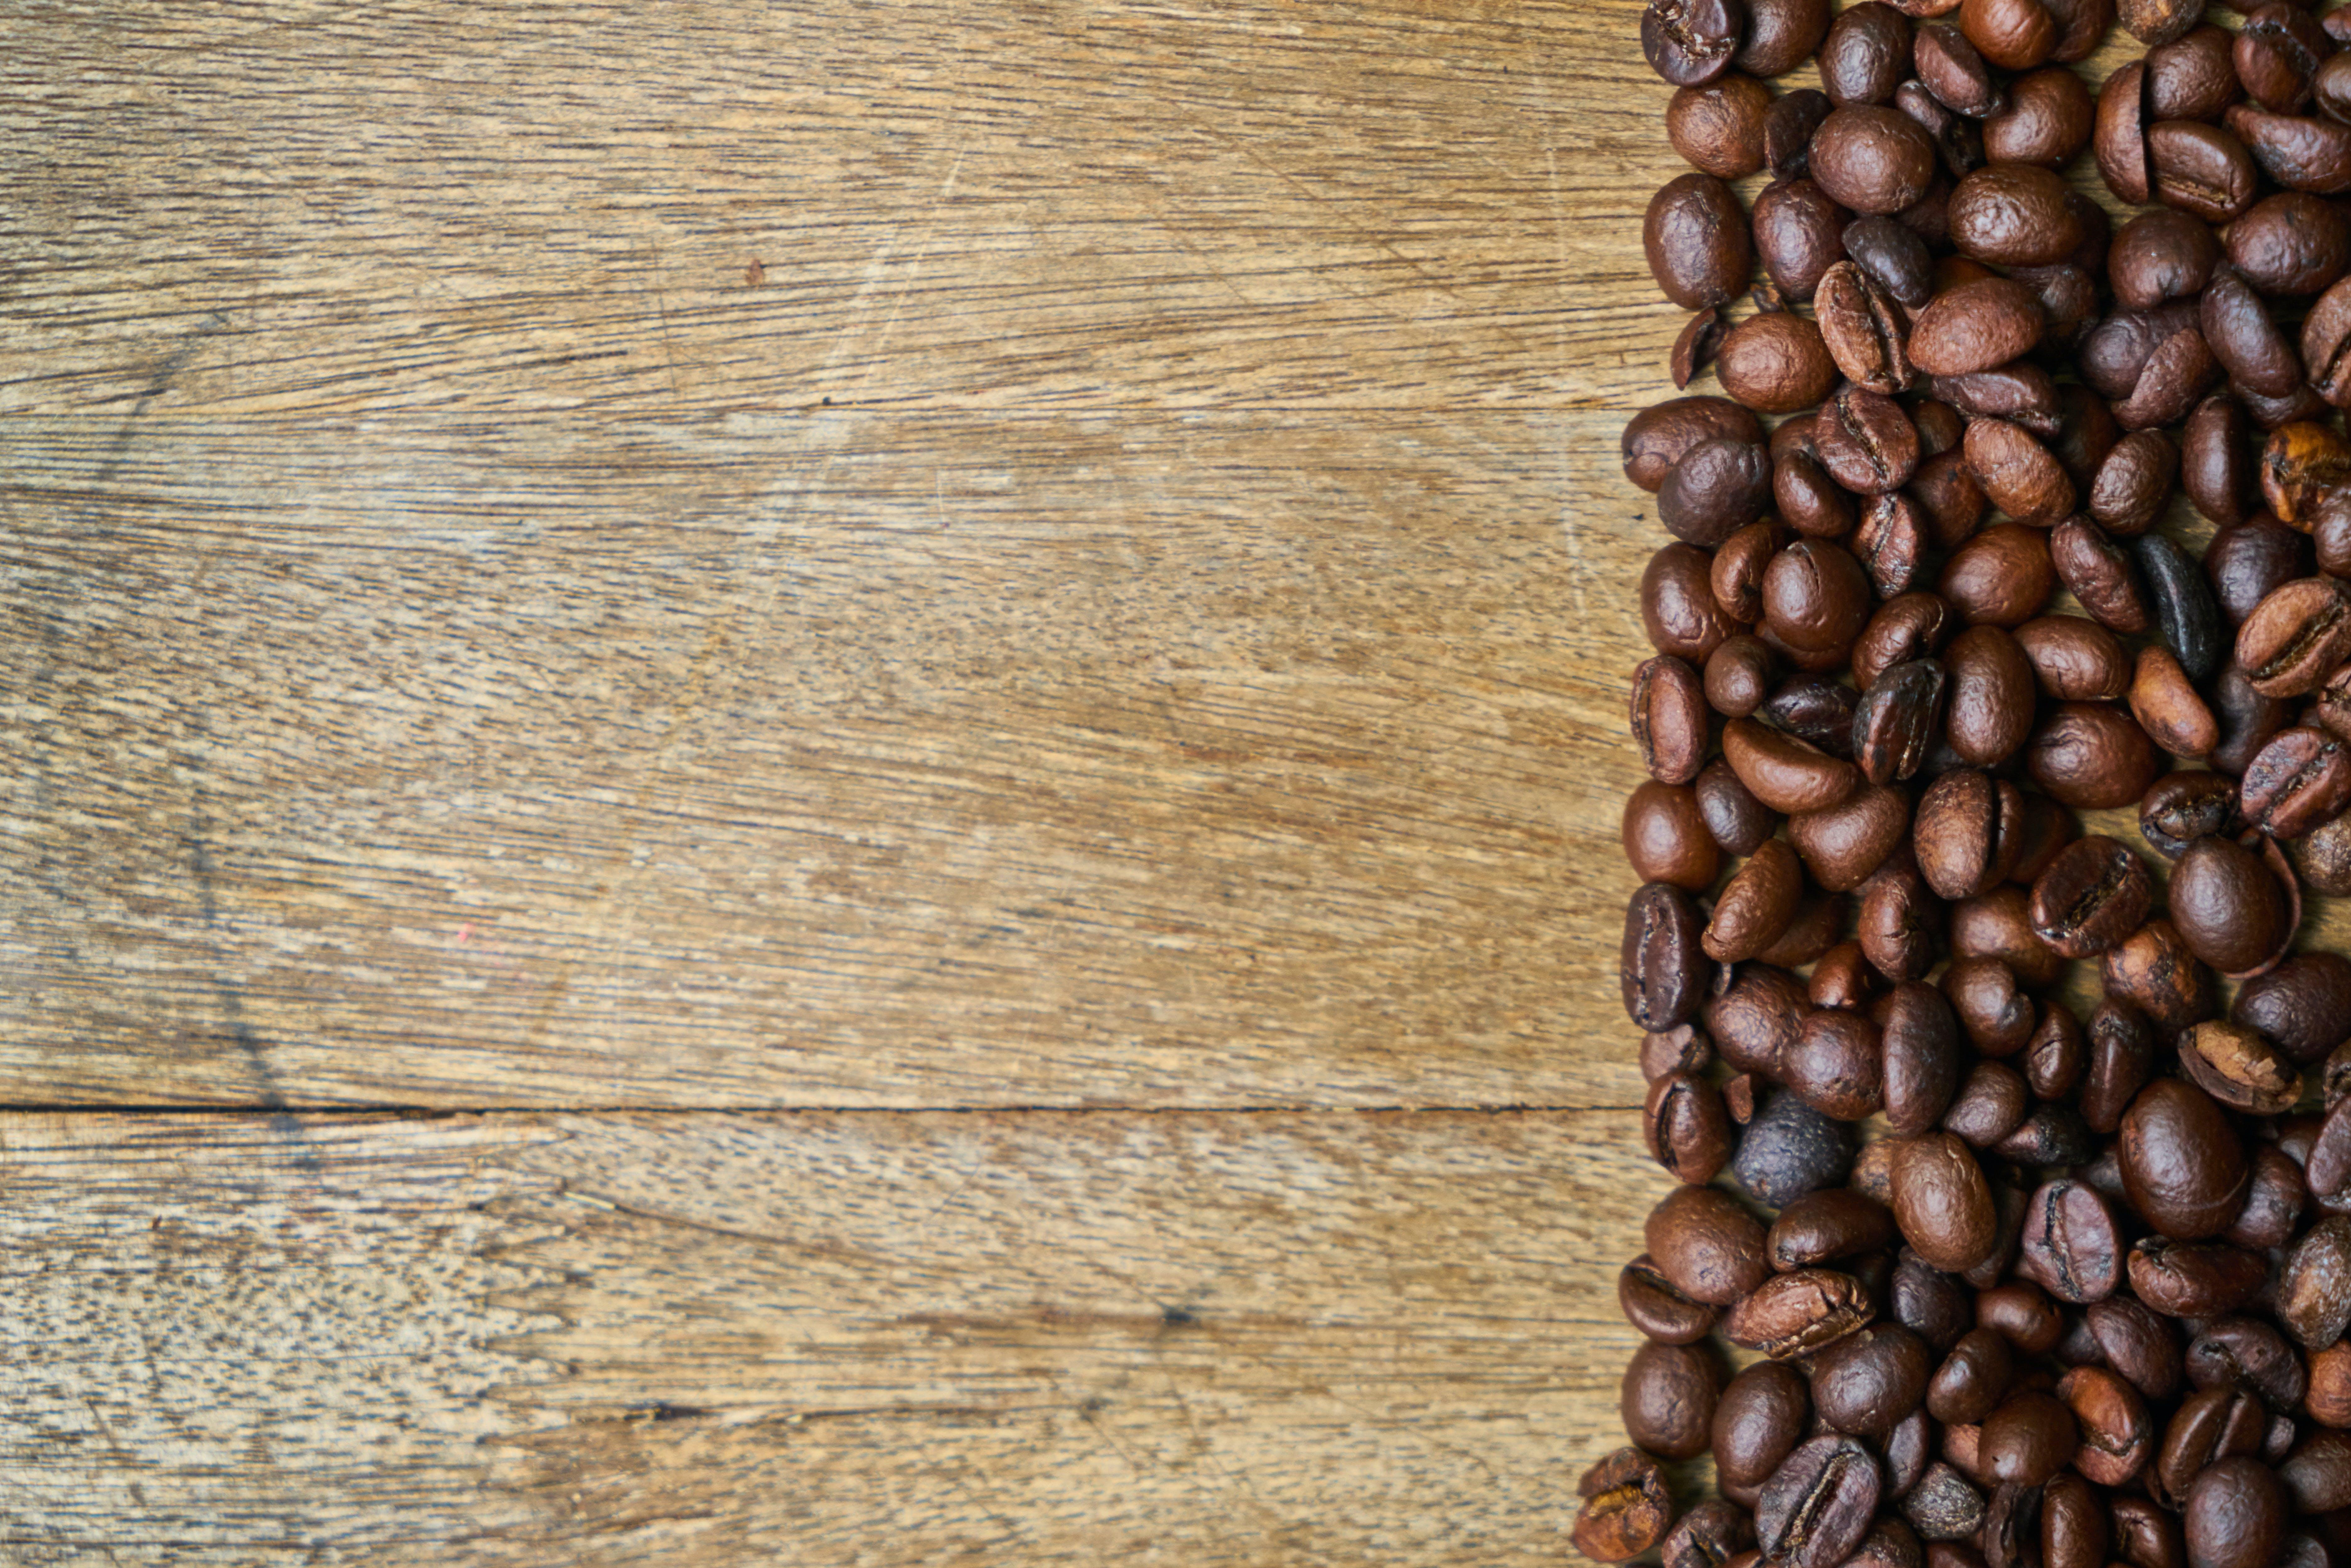 brown, caffeine, coffee